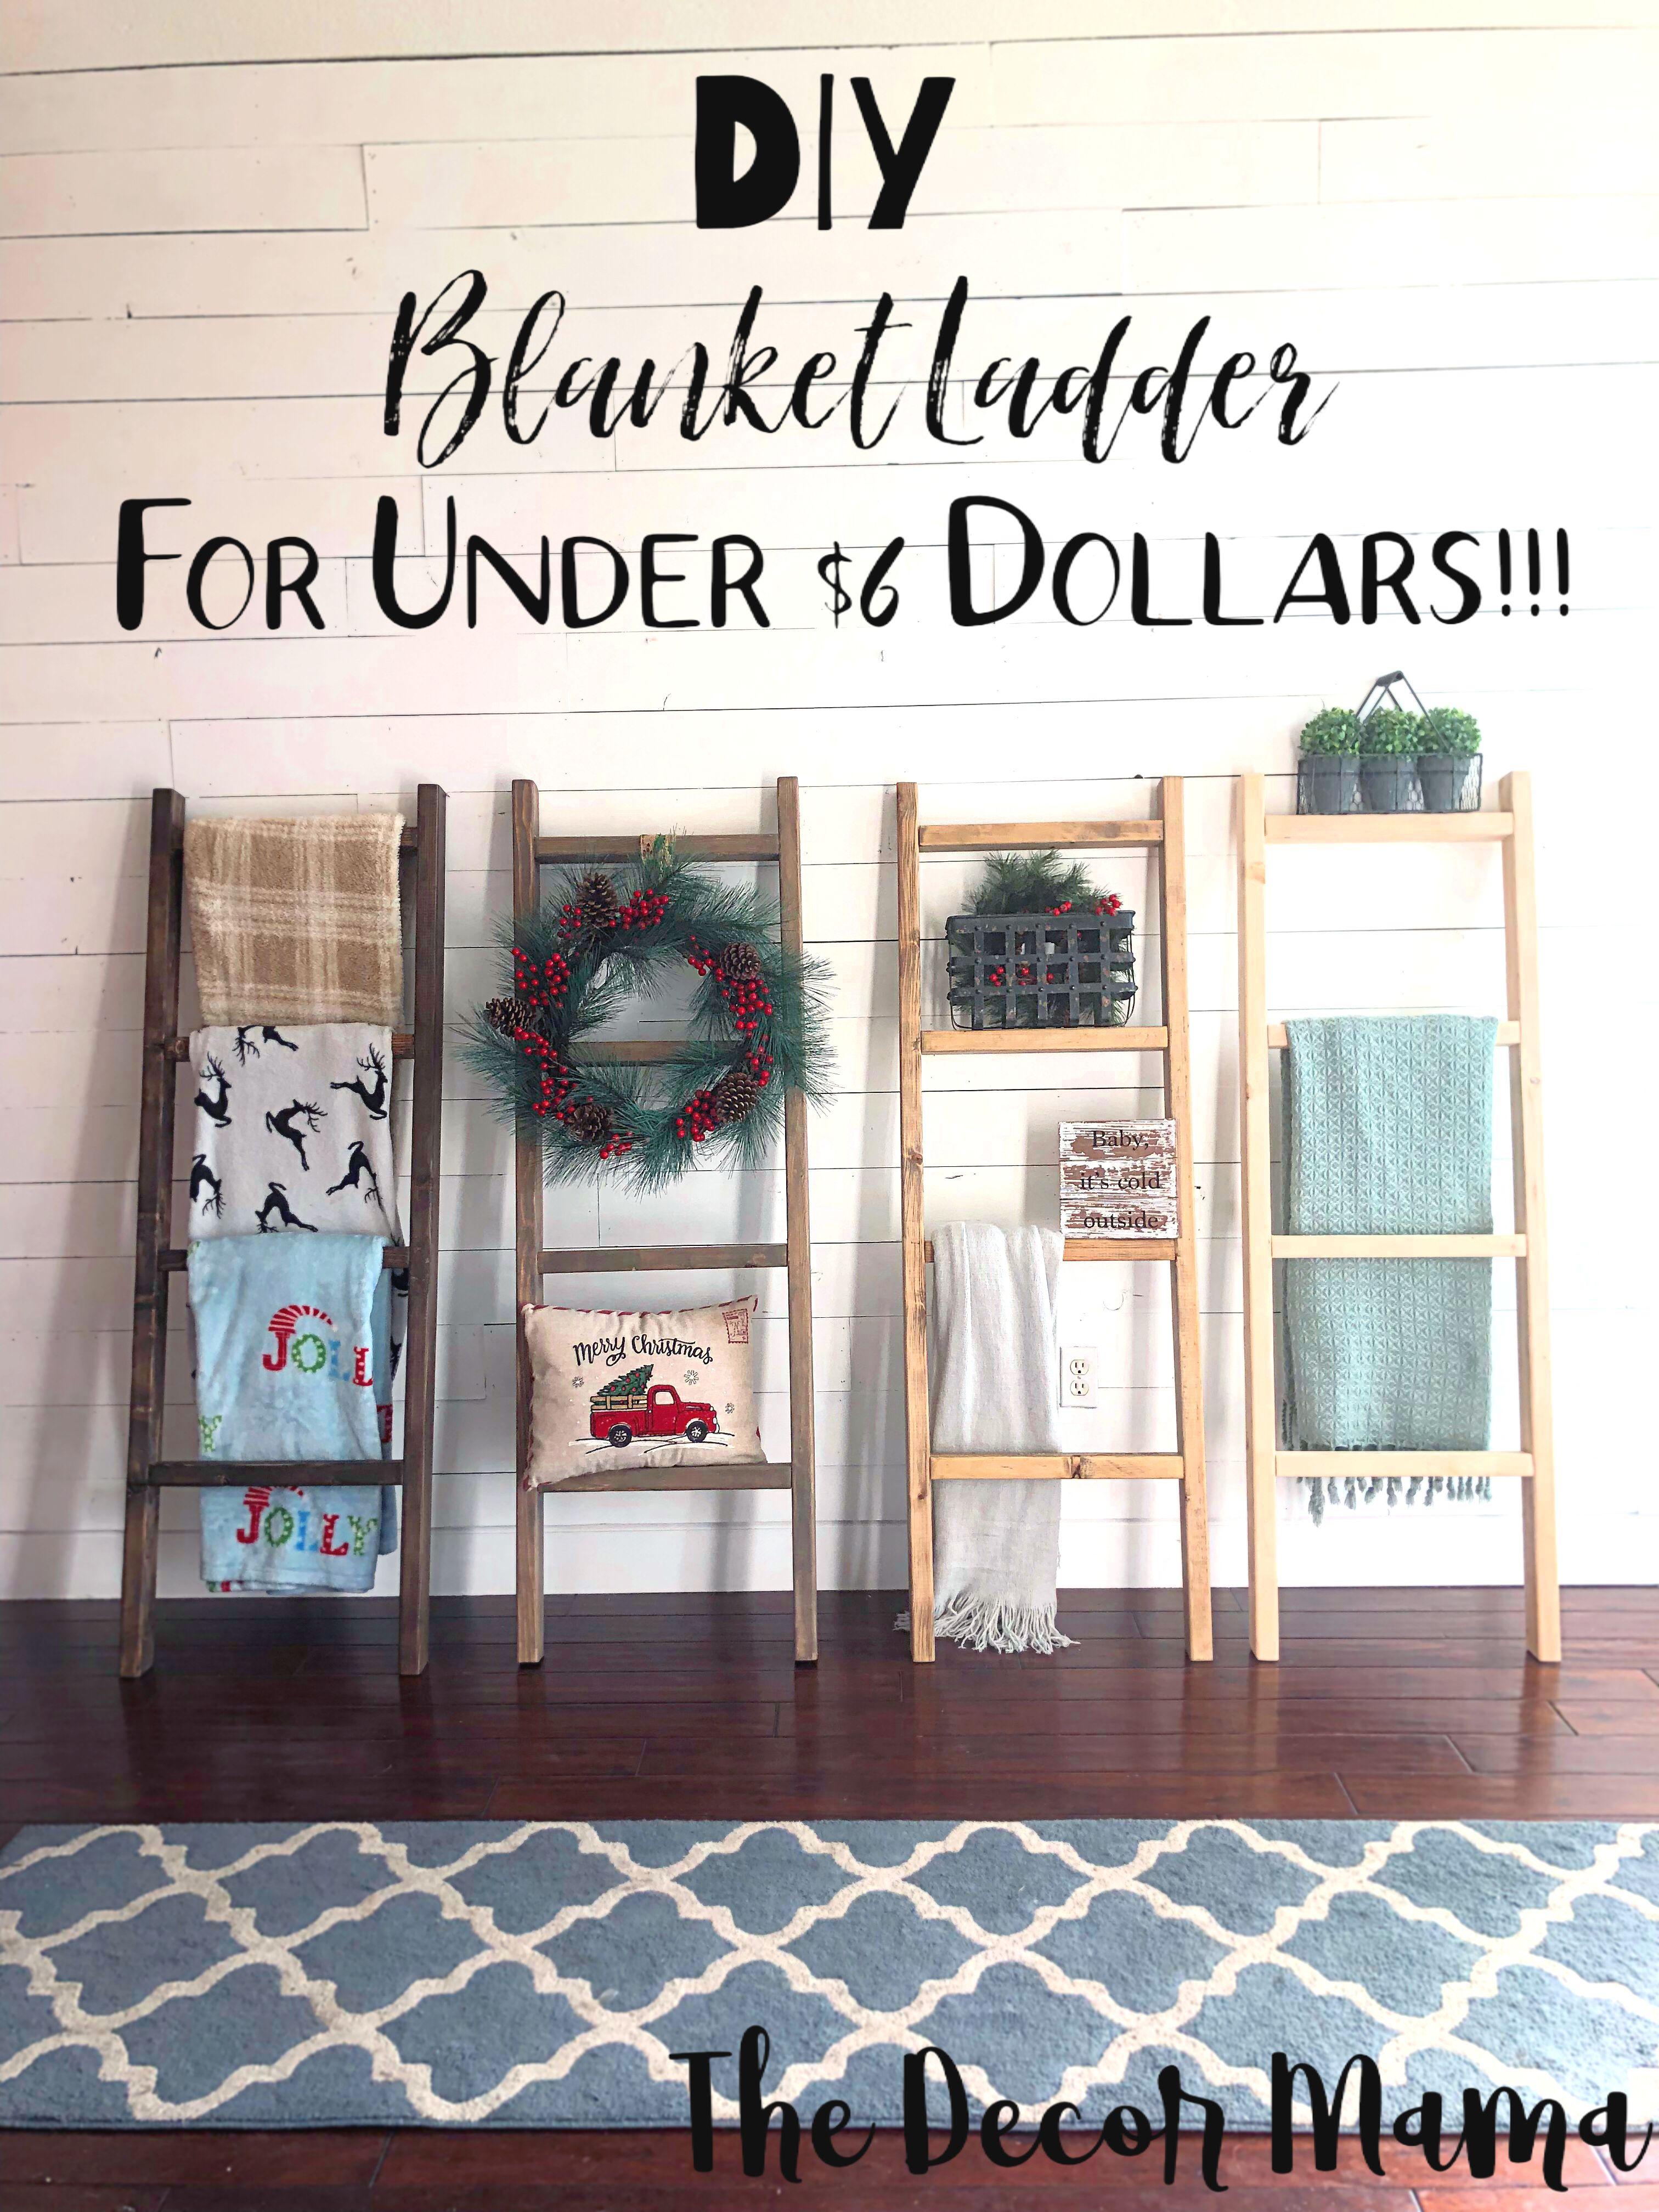 DIY Blanket Ladder for Under $6!!! - The Decor Mama images